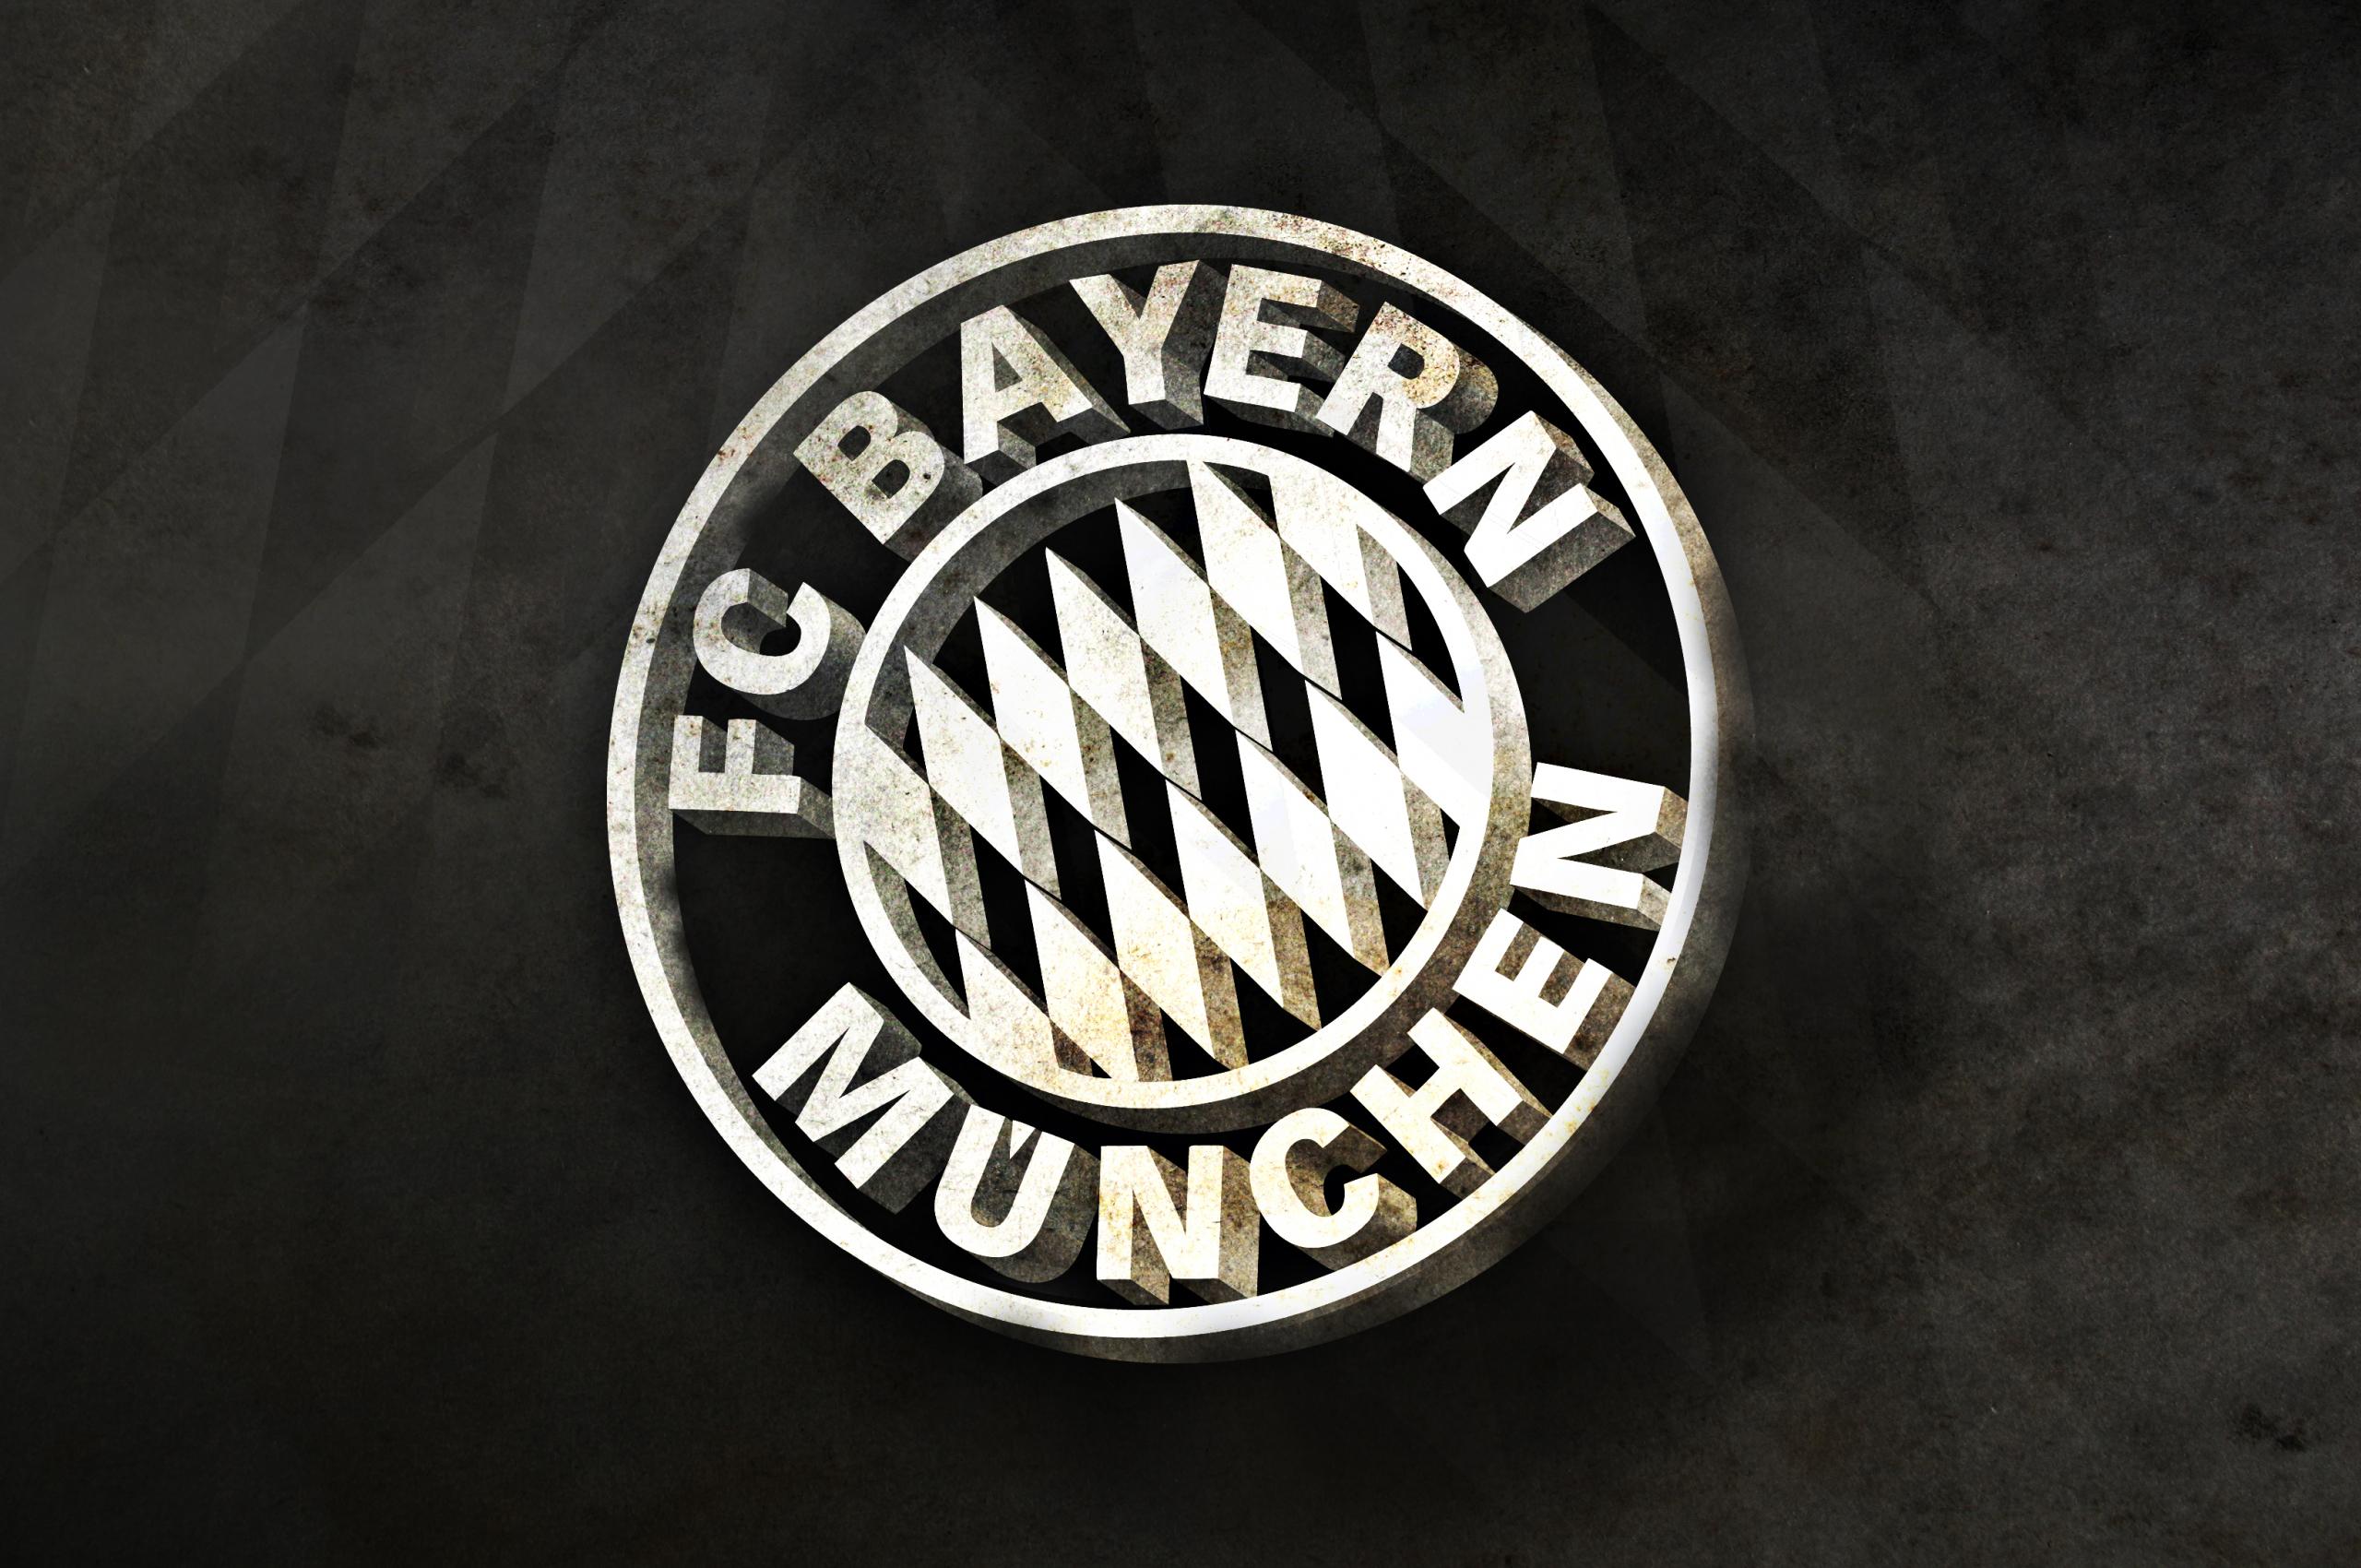 Free Download Wallpaper Bayern Munchen Hd Gratis Gambar Wallpaper